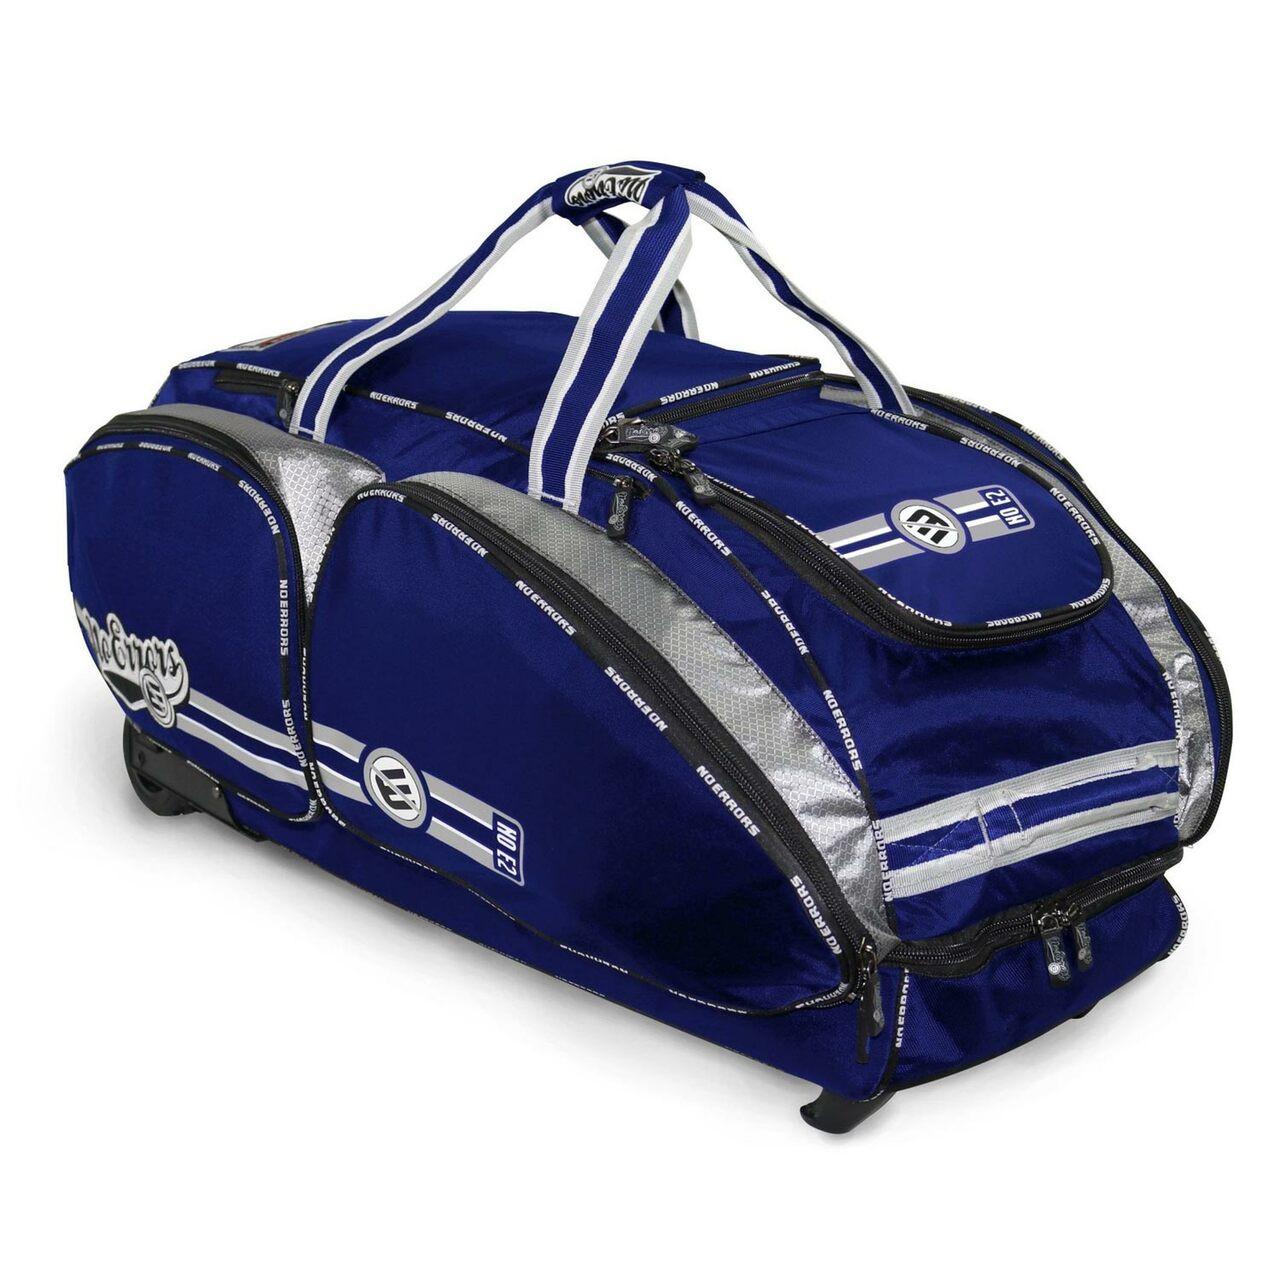 No Errors E2 Catchers Bag purple